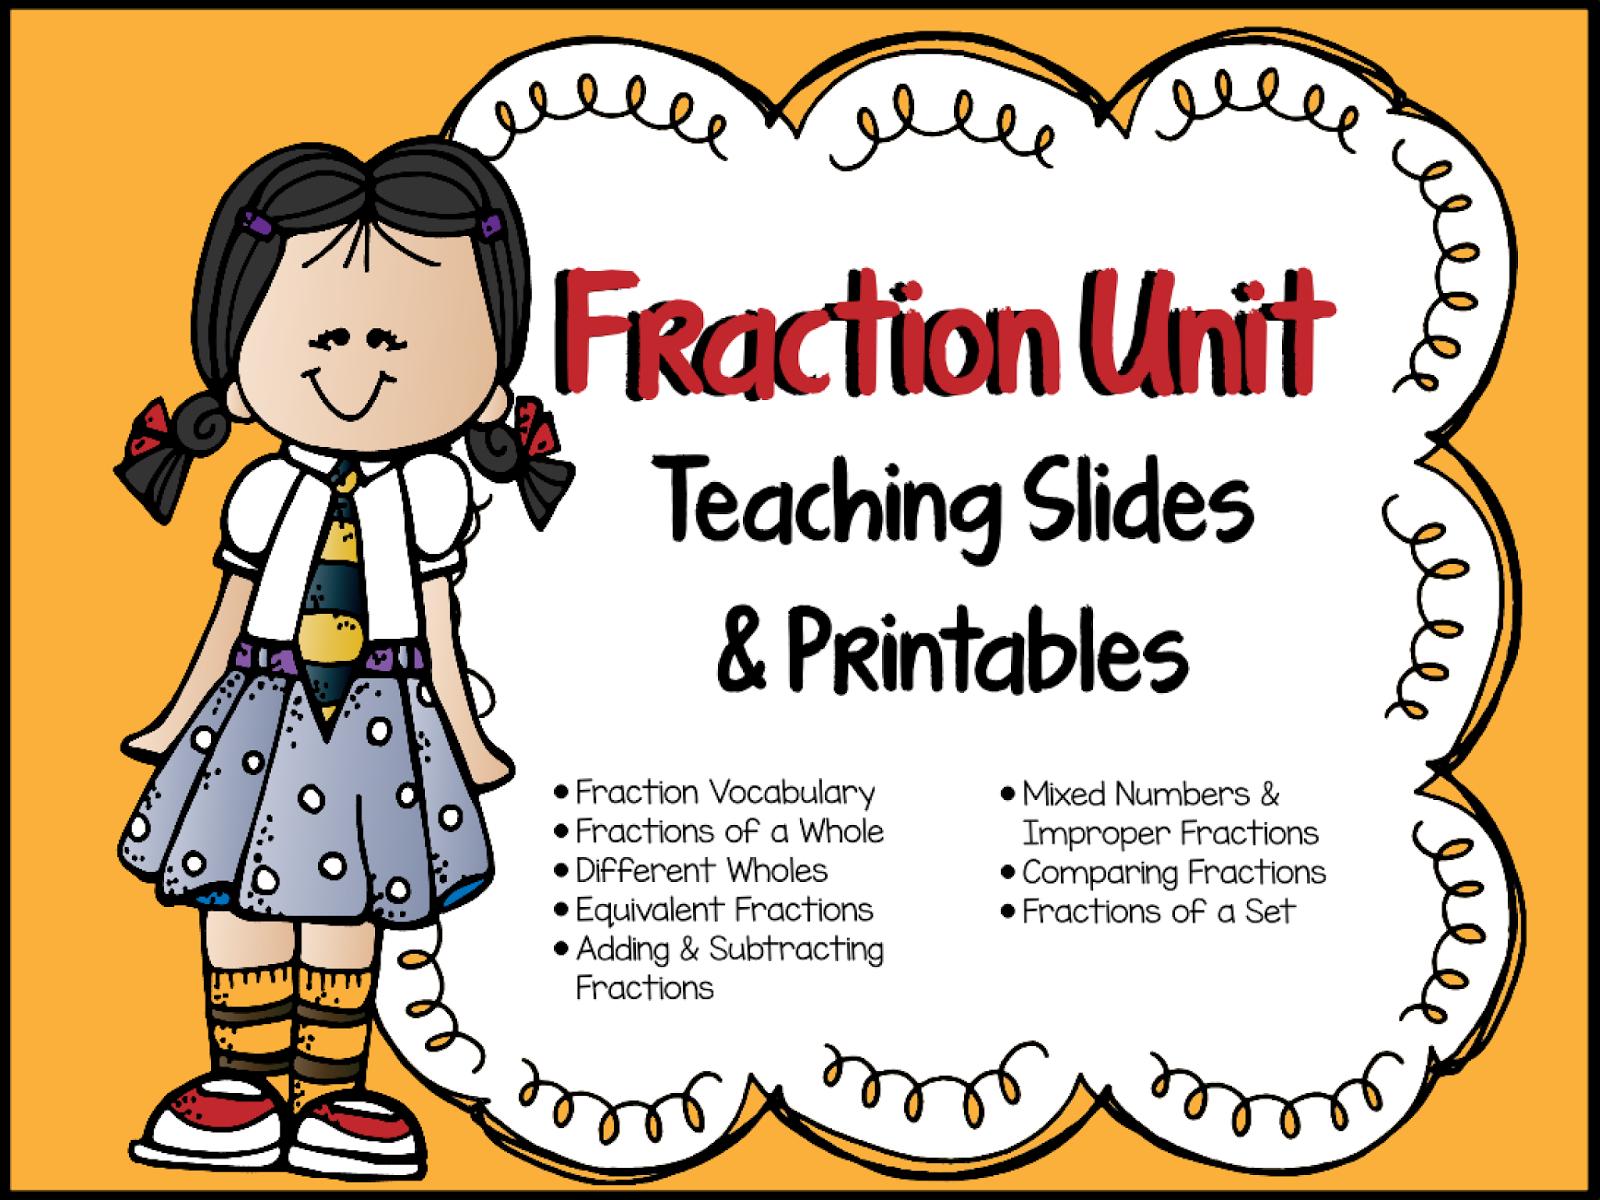 worksheet Fraction Printables 100 fraction printables best decimals images on tales from a fourth grade mathnut freebie